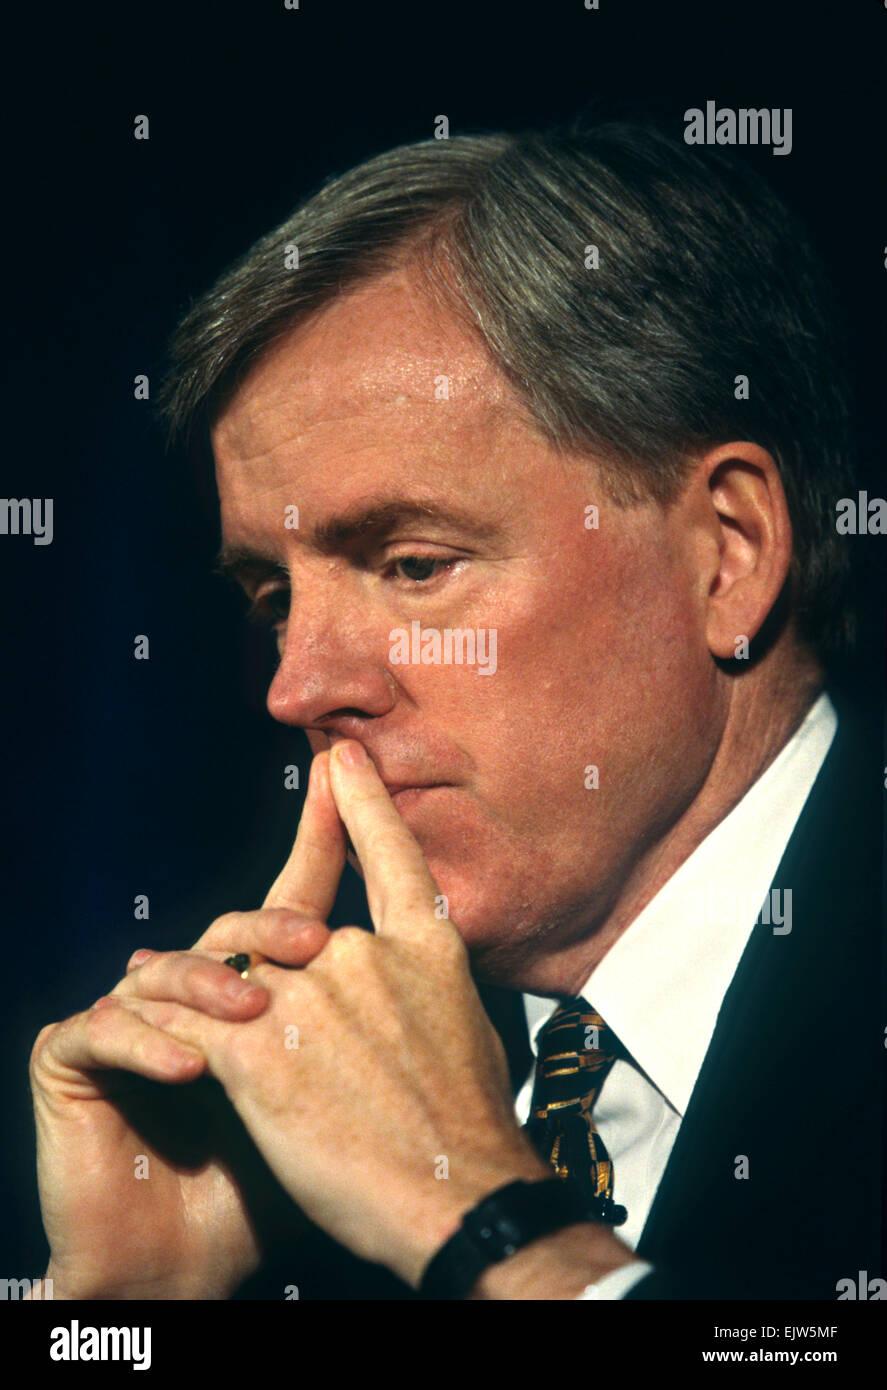 Netscape CEO Jim Barksdale June 4, 1997 in Washington, DC. - Stock Image